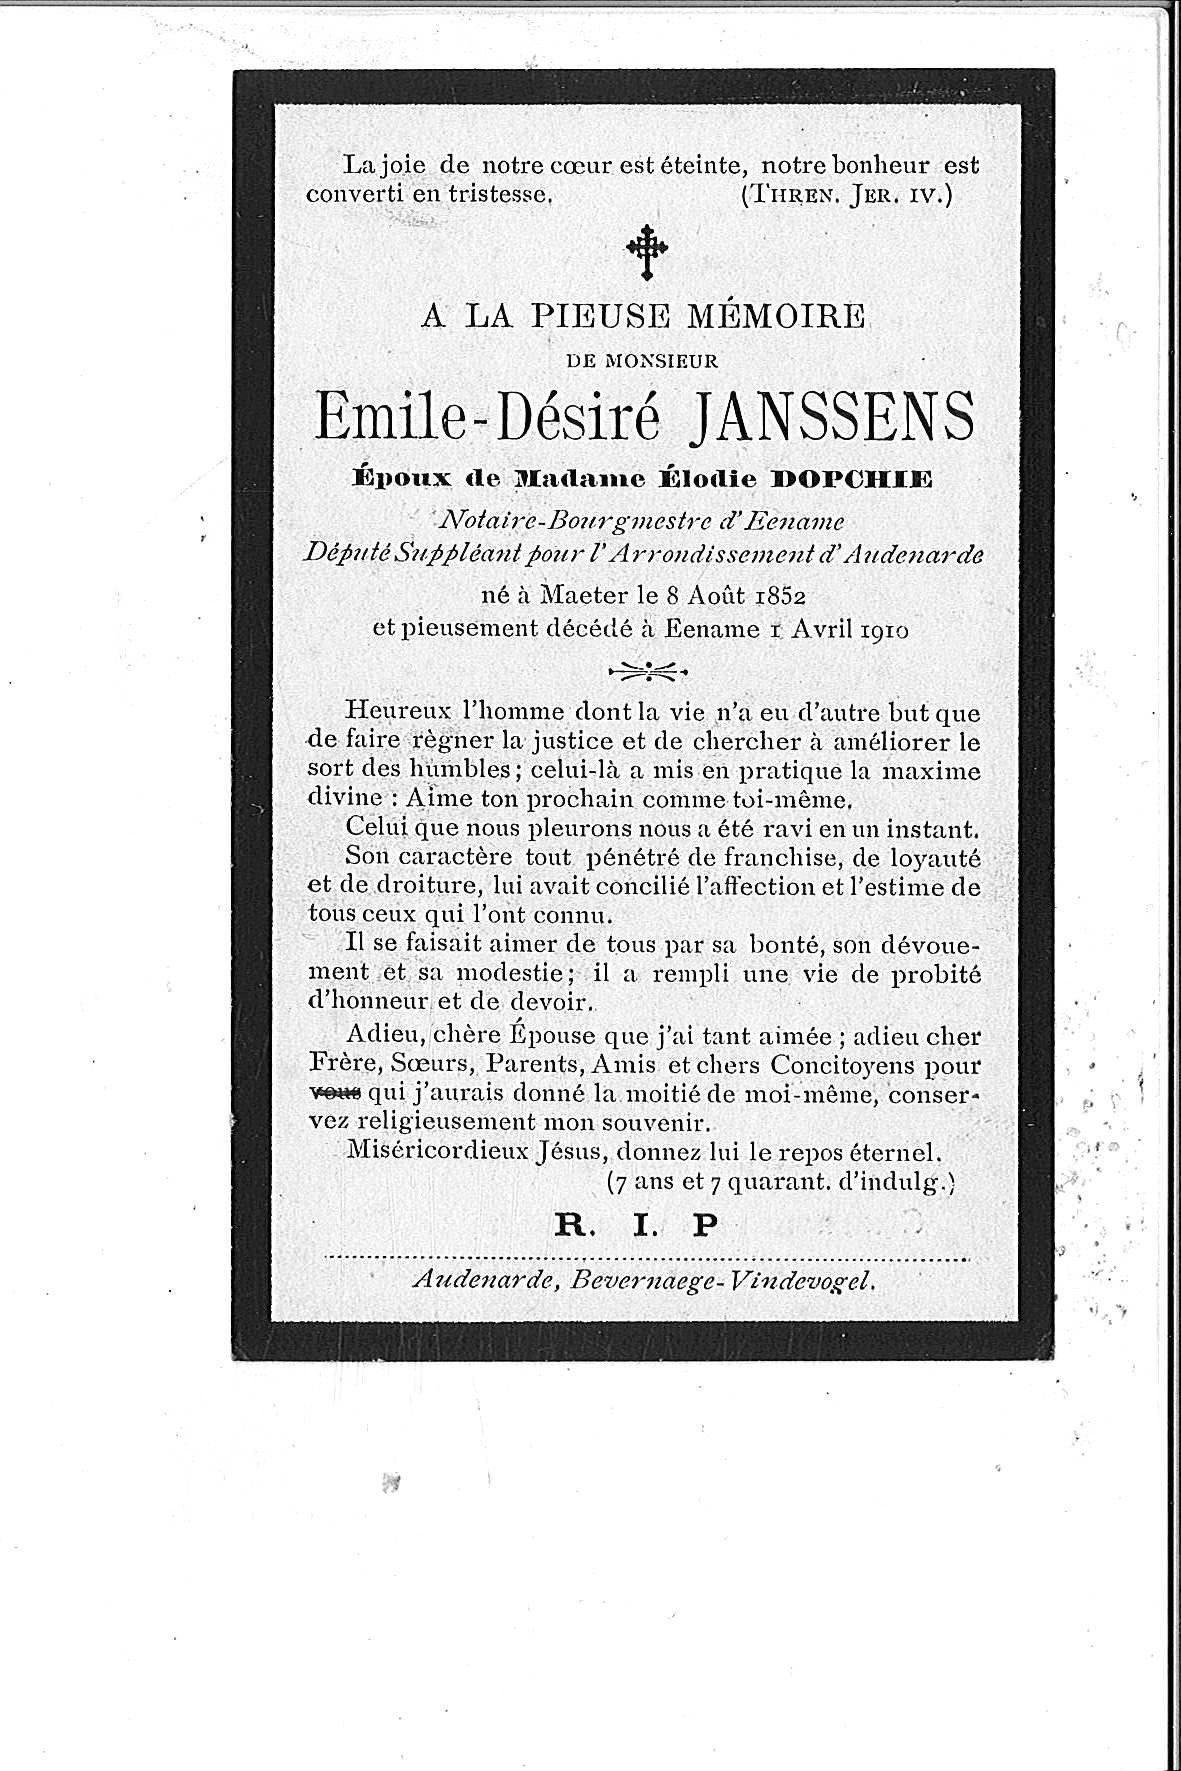 Emile-Désiré(1910)20150323111051_00051.jpg